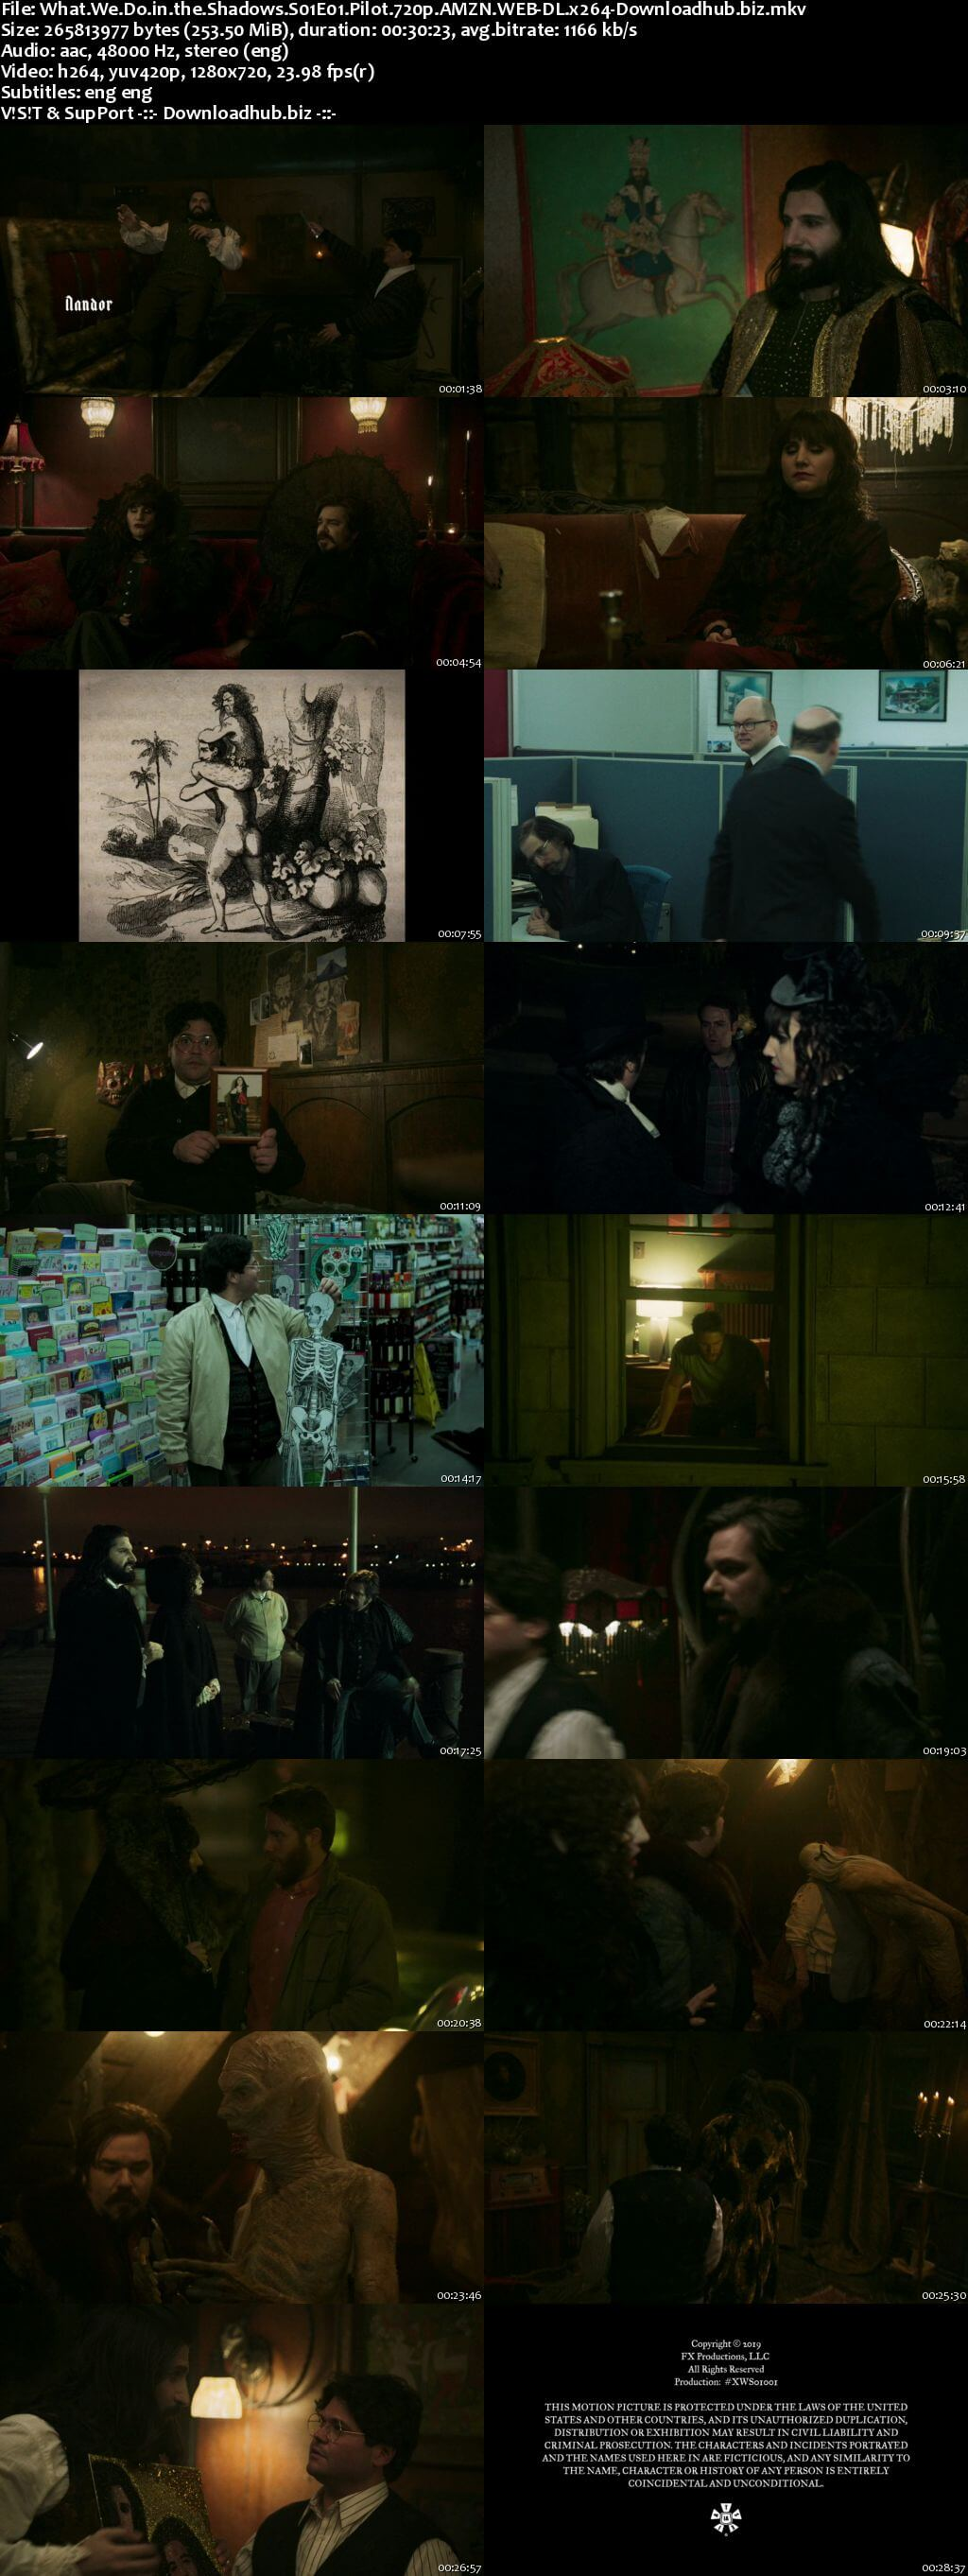 What We Do in the Shadows S01E01 250MB AMZN WEB-DL 720p ESubs